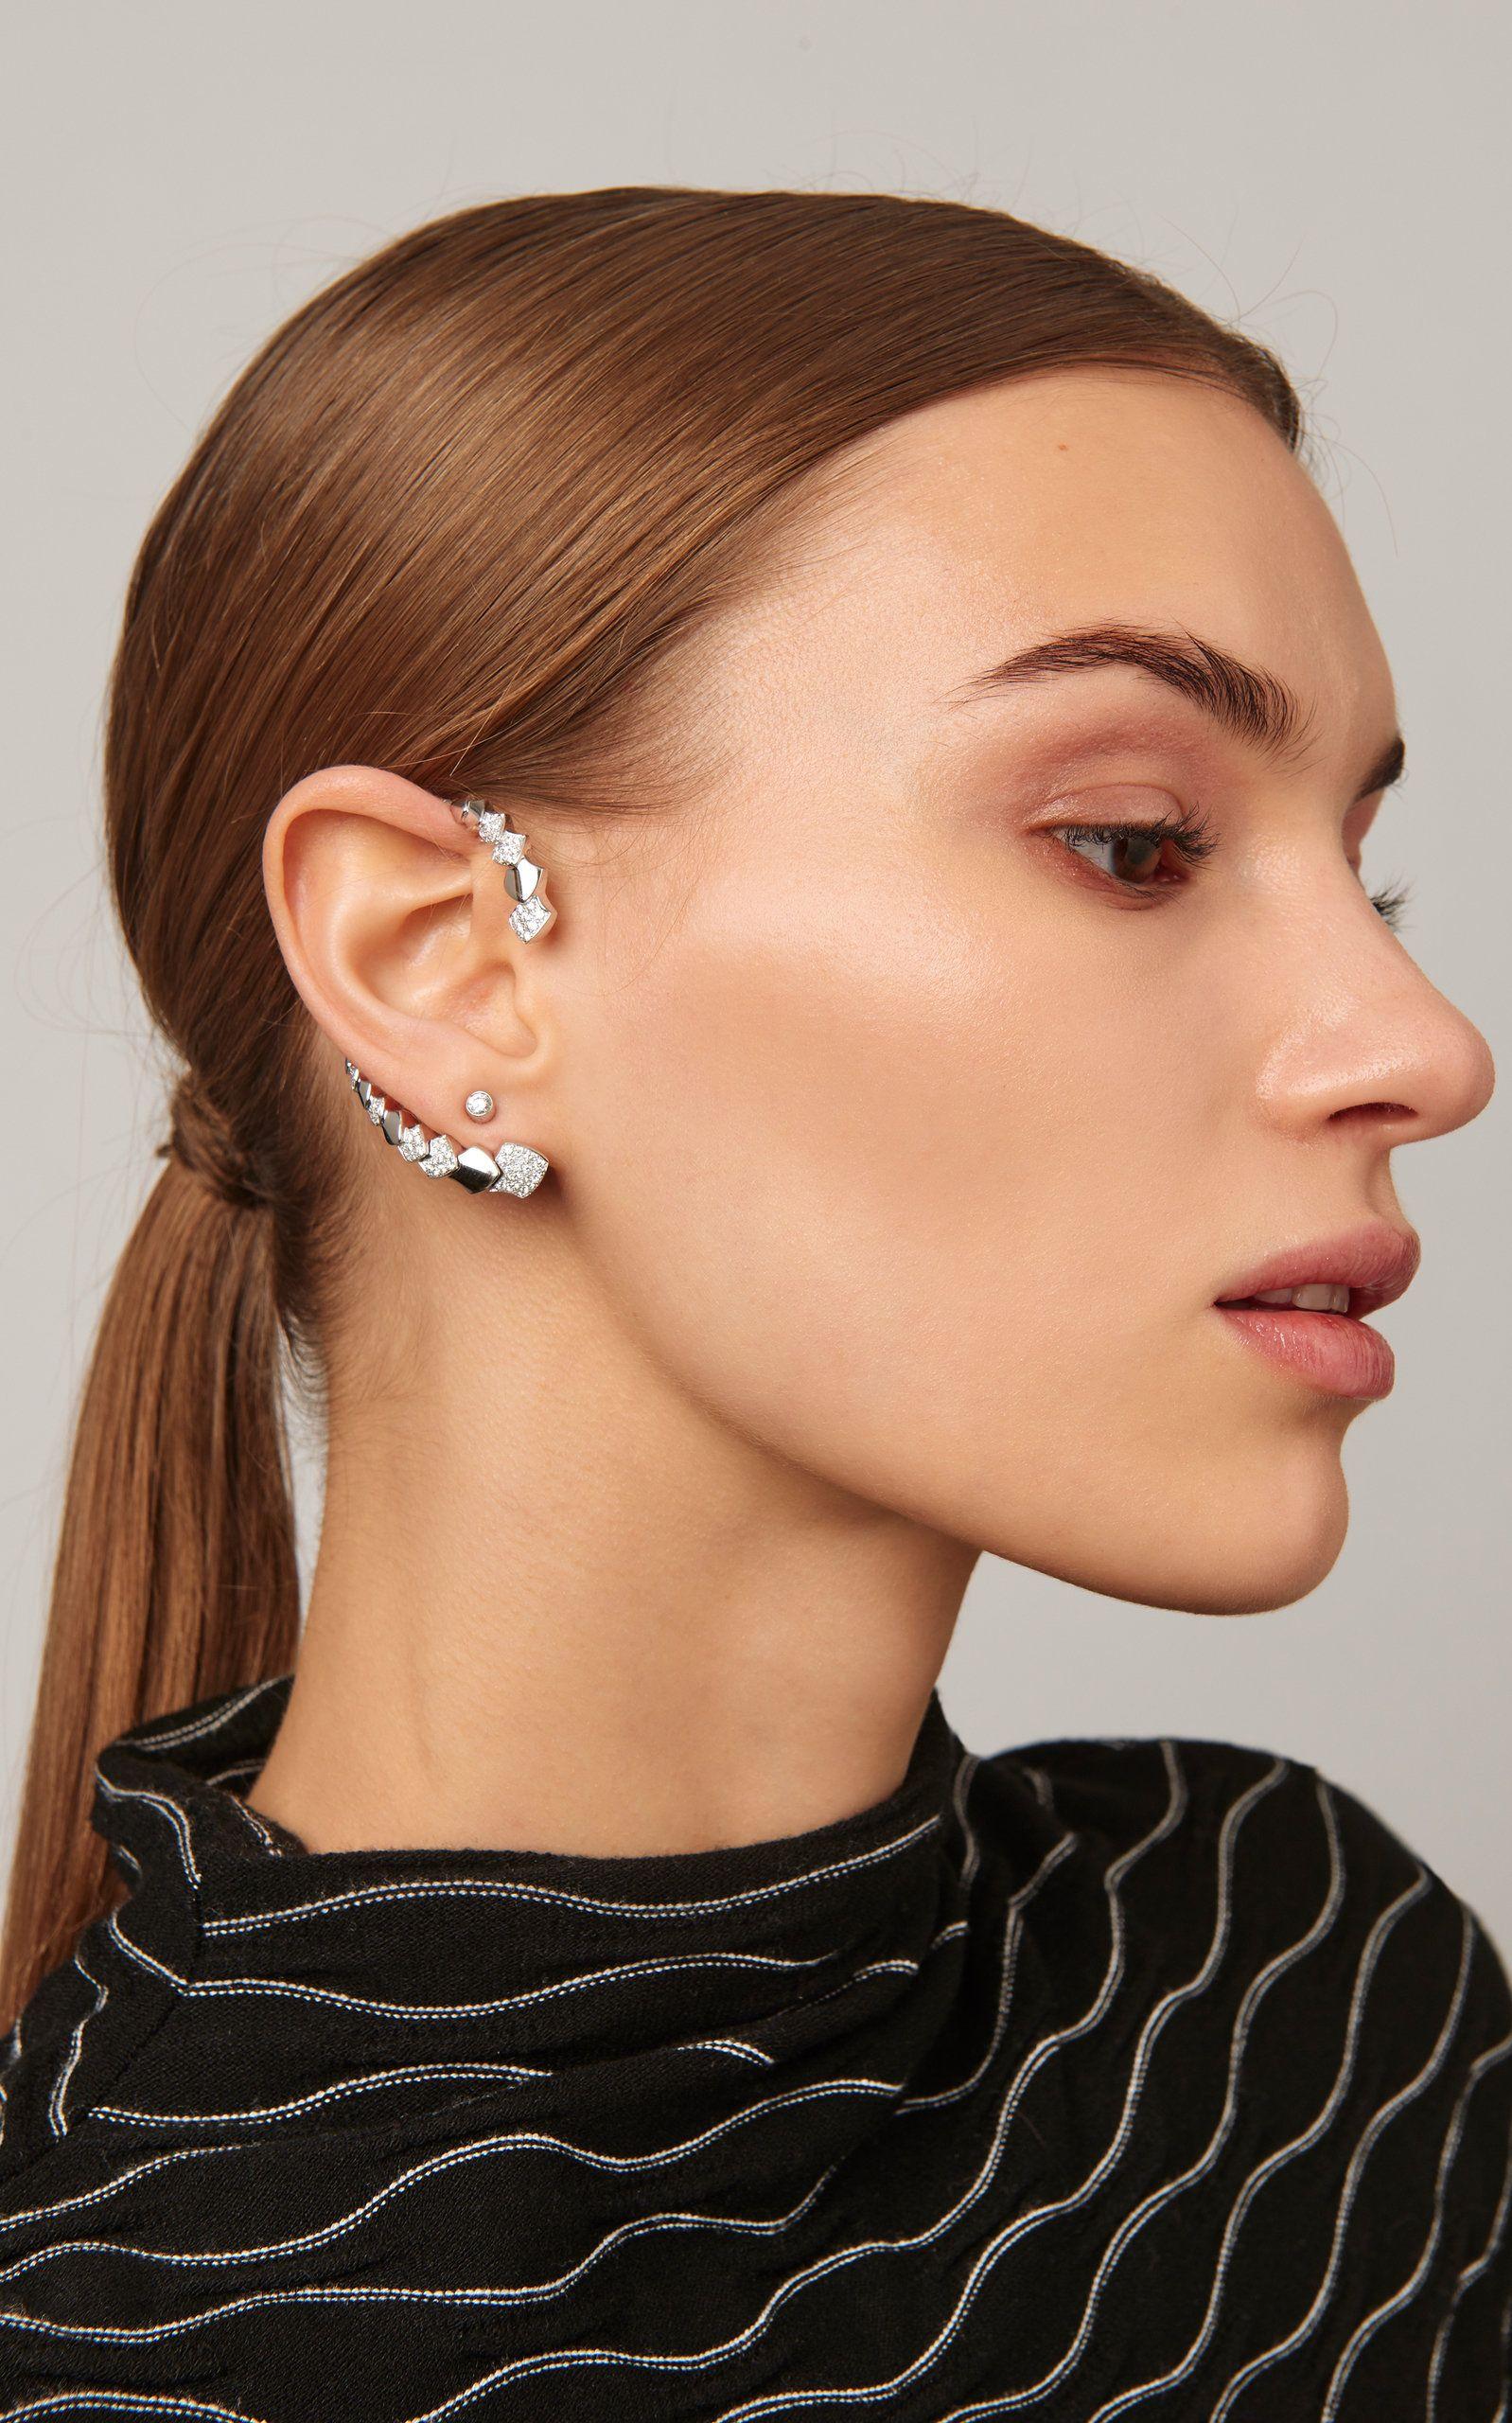 b9fe3cd9d Akillis Python 18K Gold Diamond Ear Cuff in 2019 | Products ...